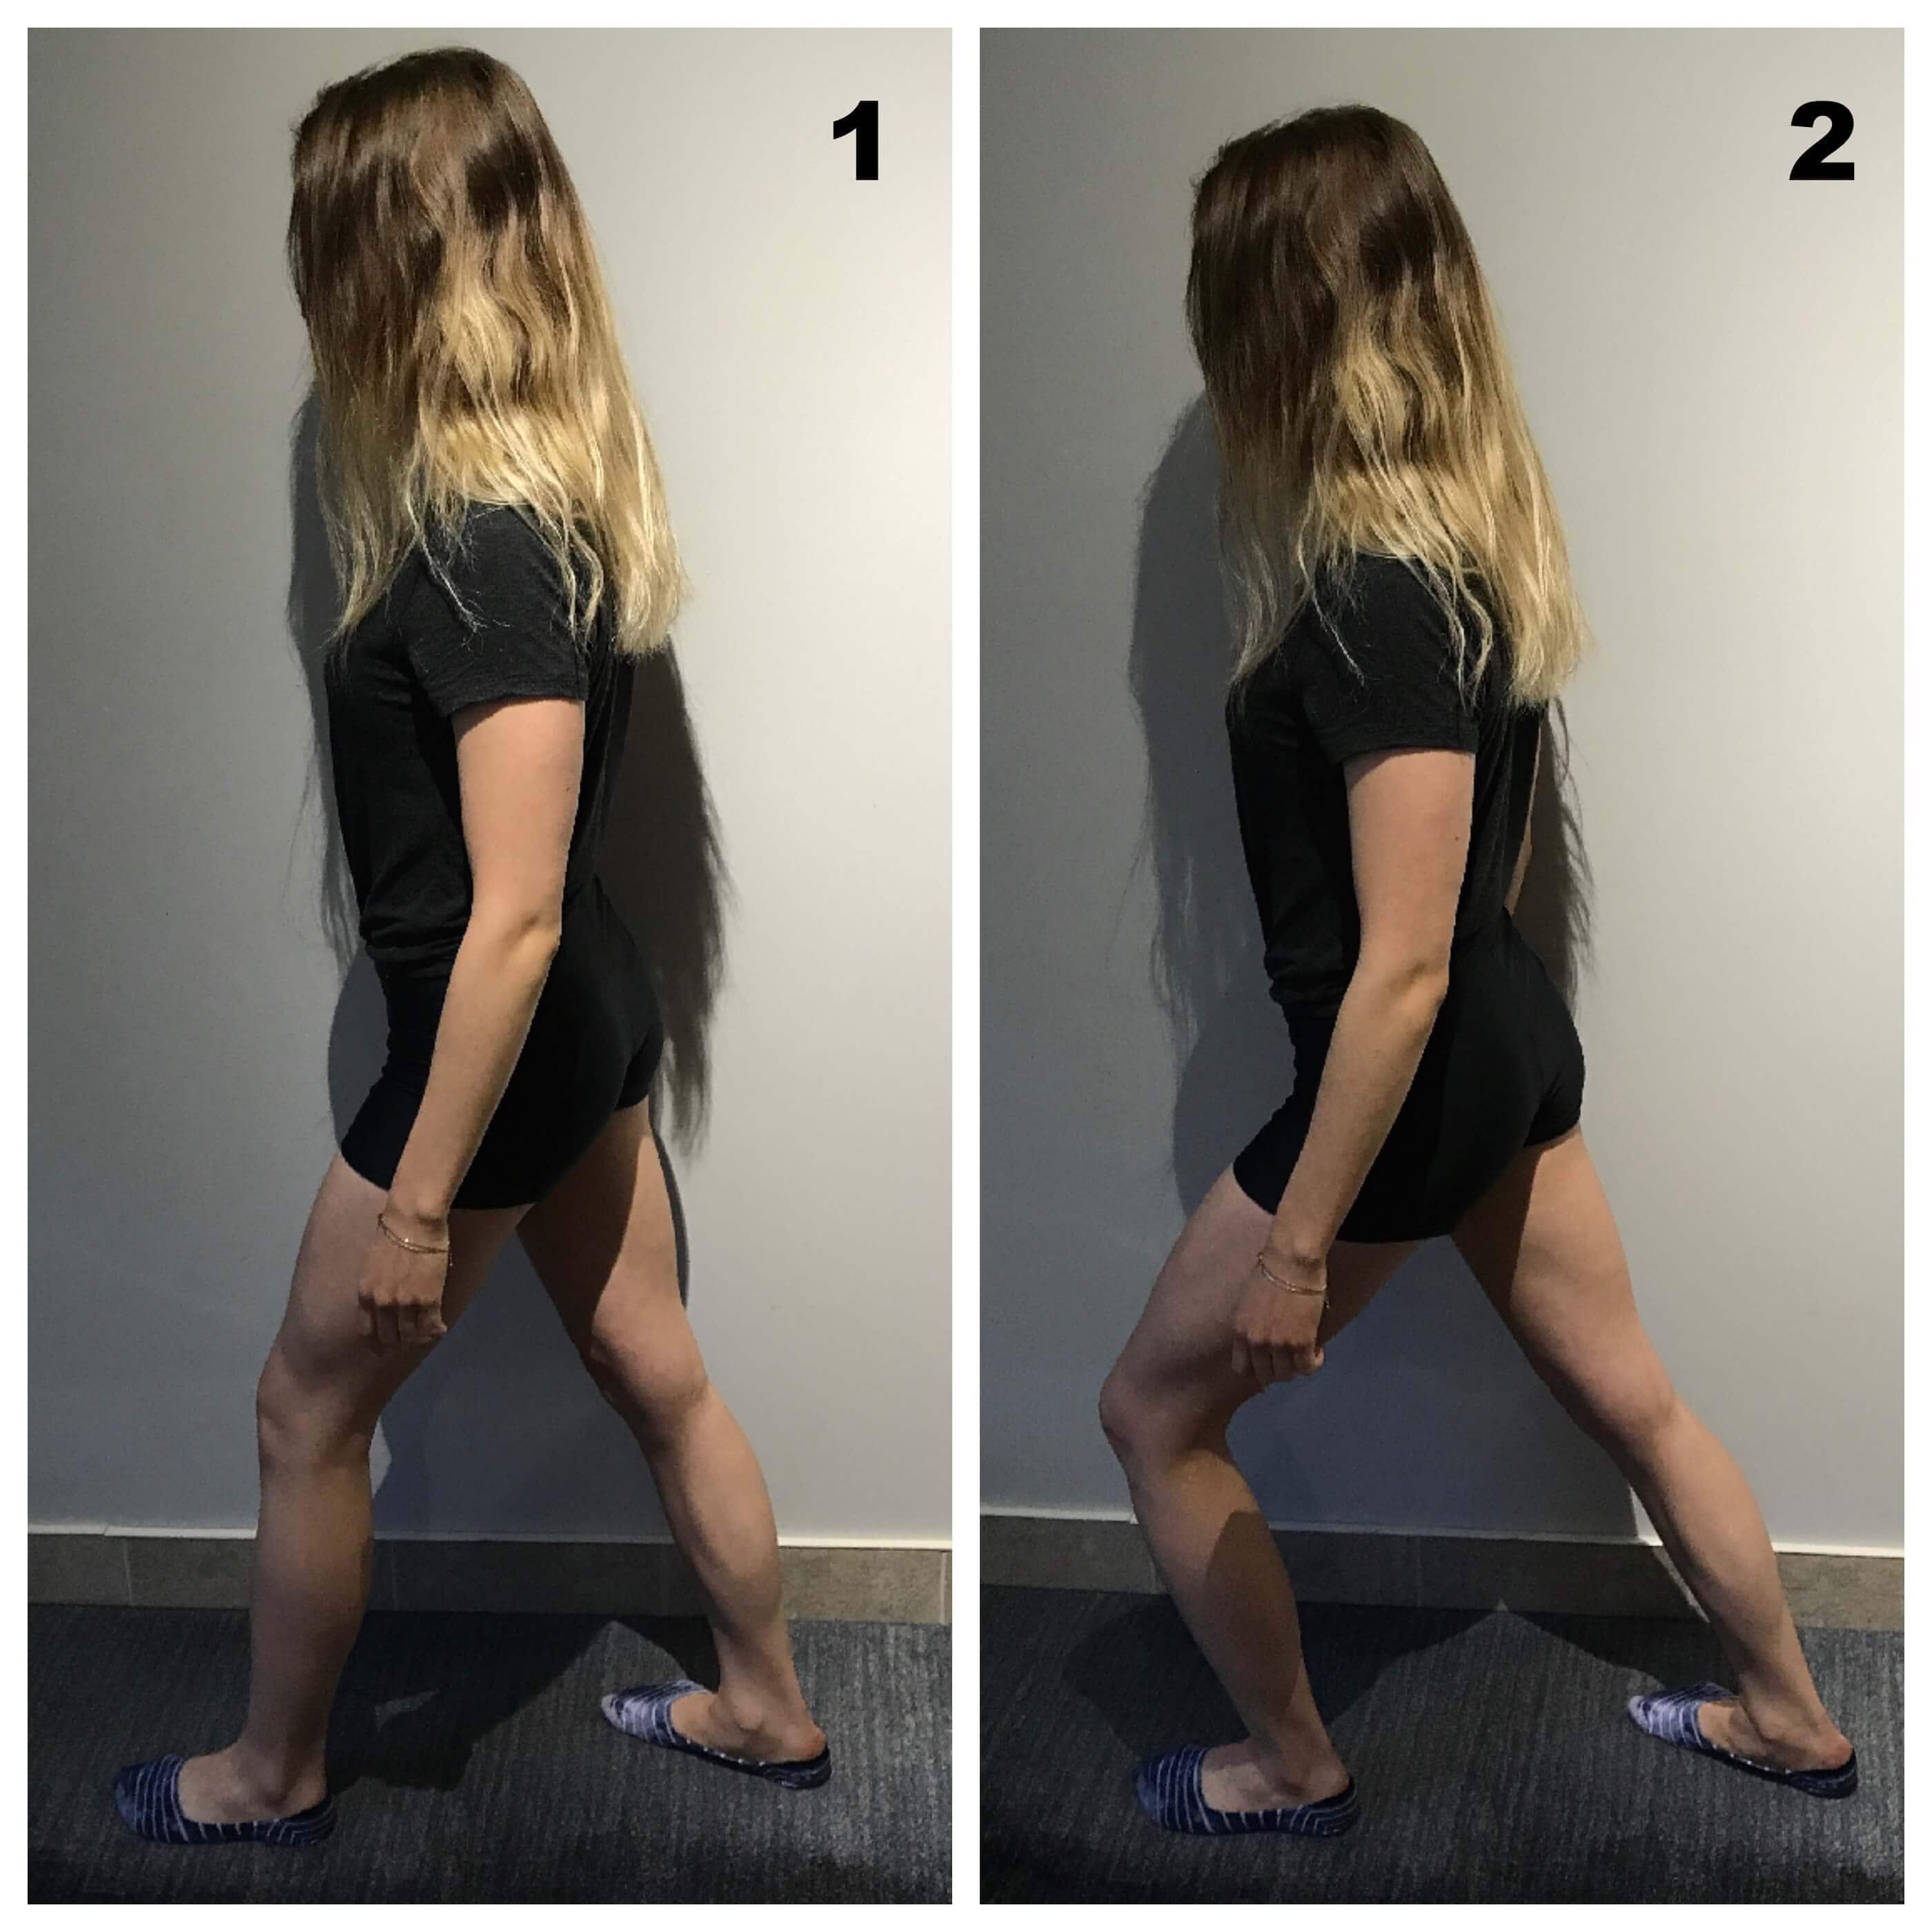 Force quadriceps debout pour syndrome femoro patellaire